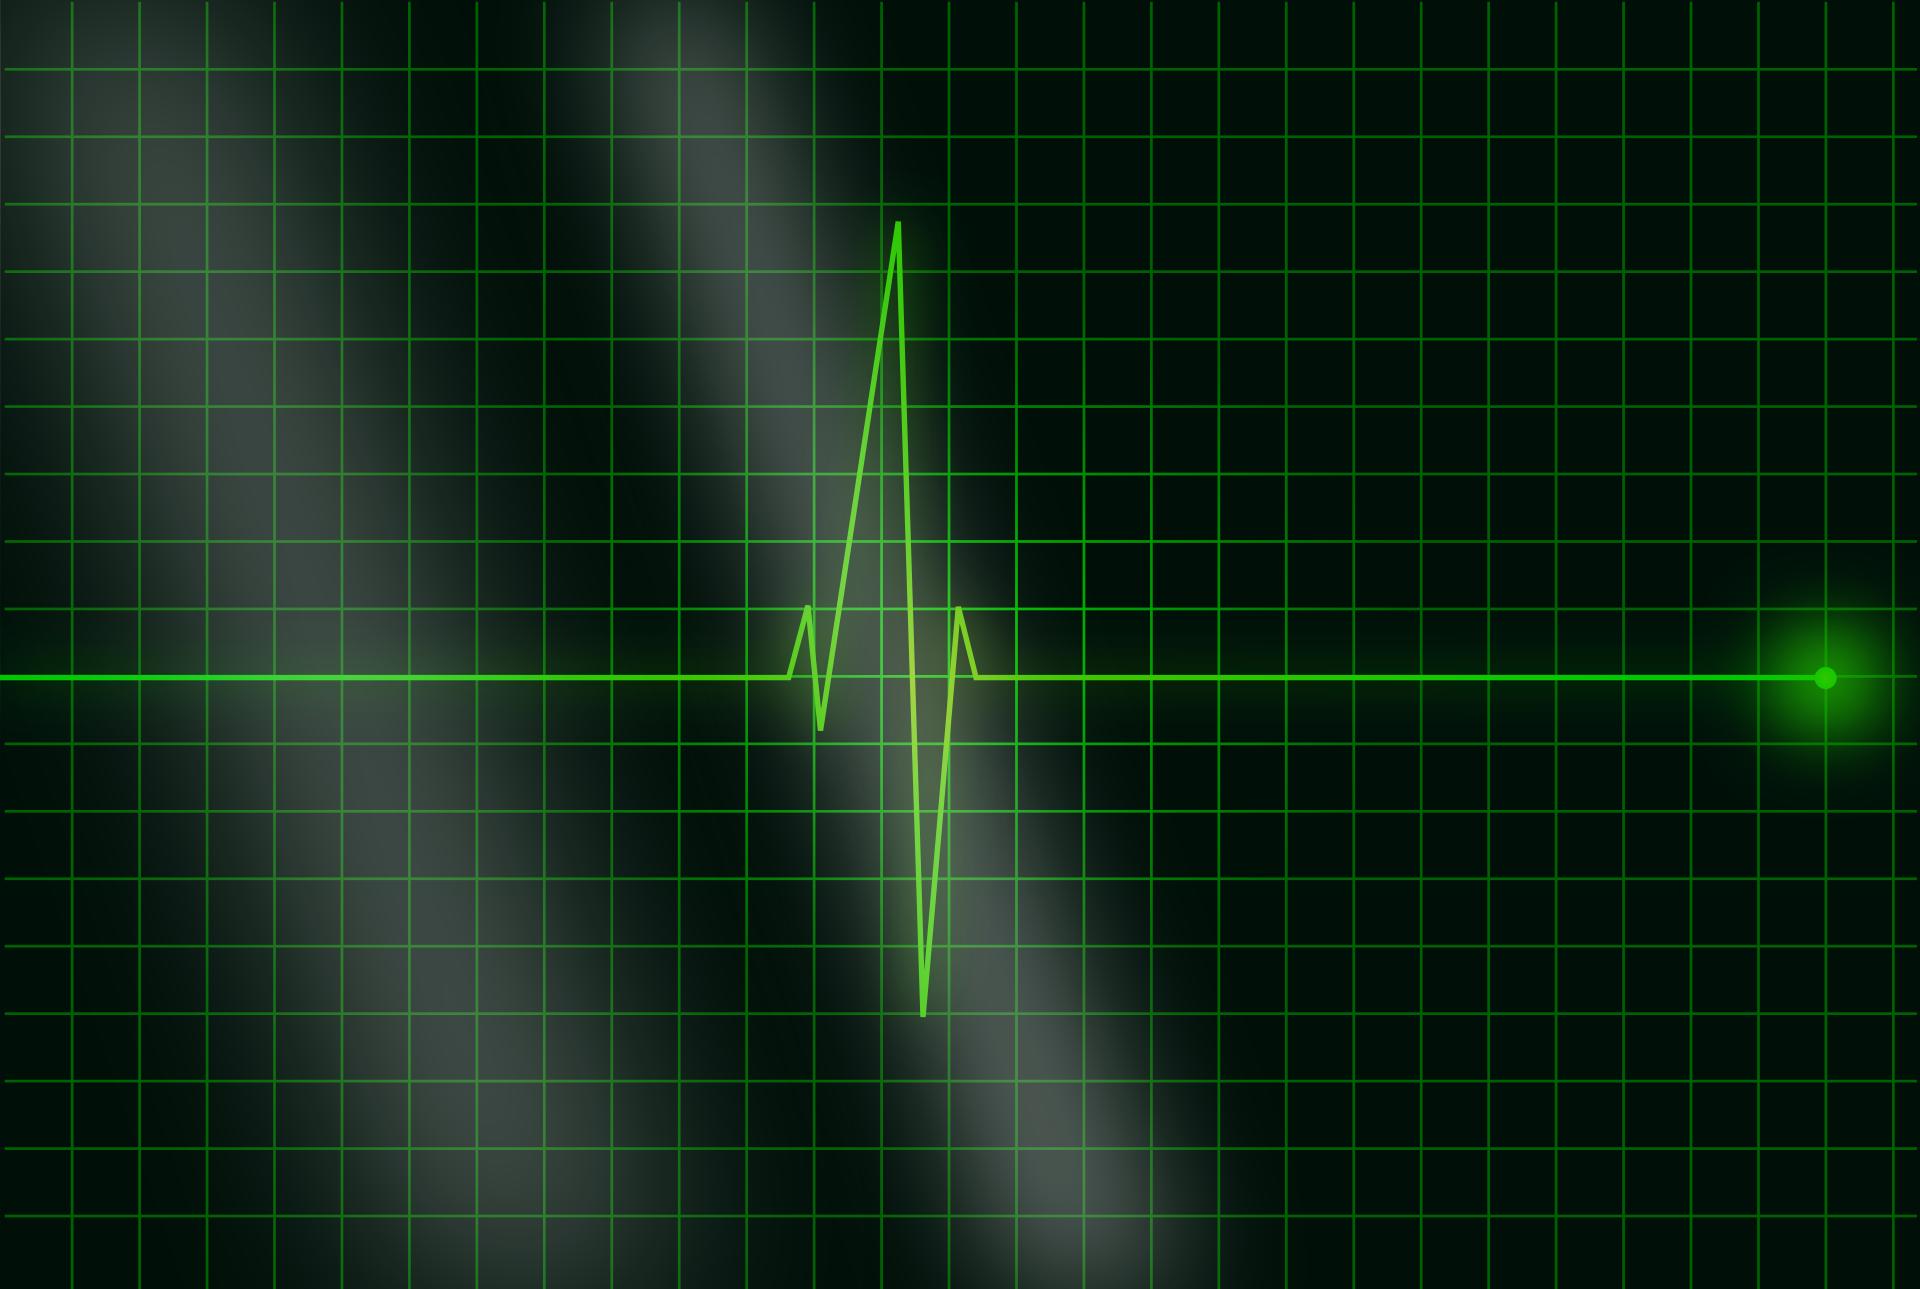 electrocardiogram-36732